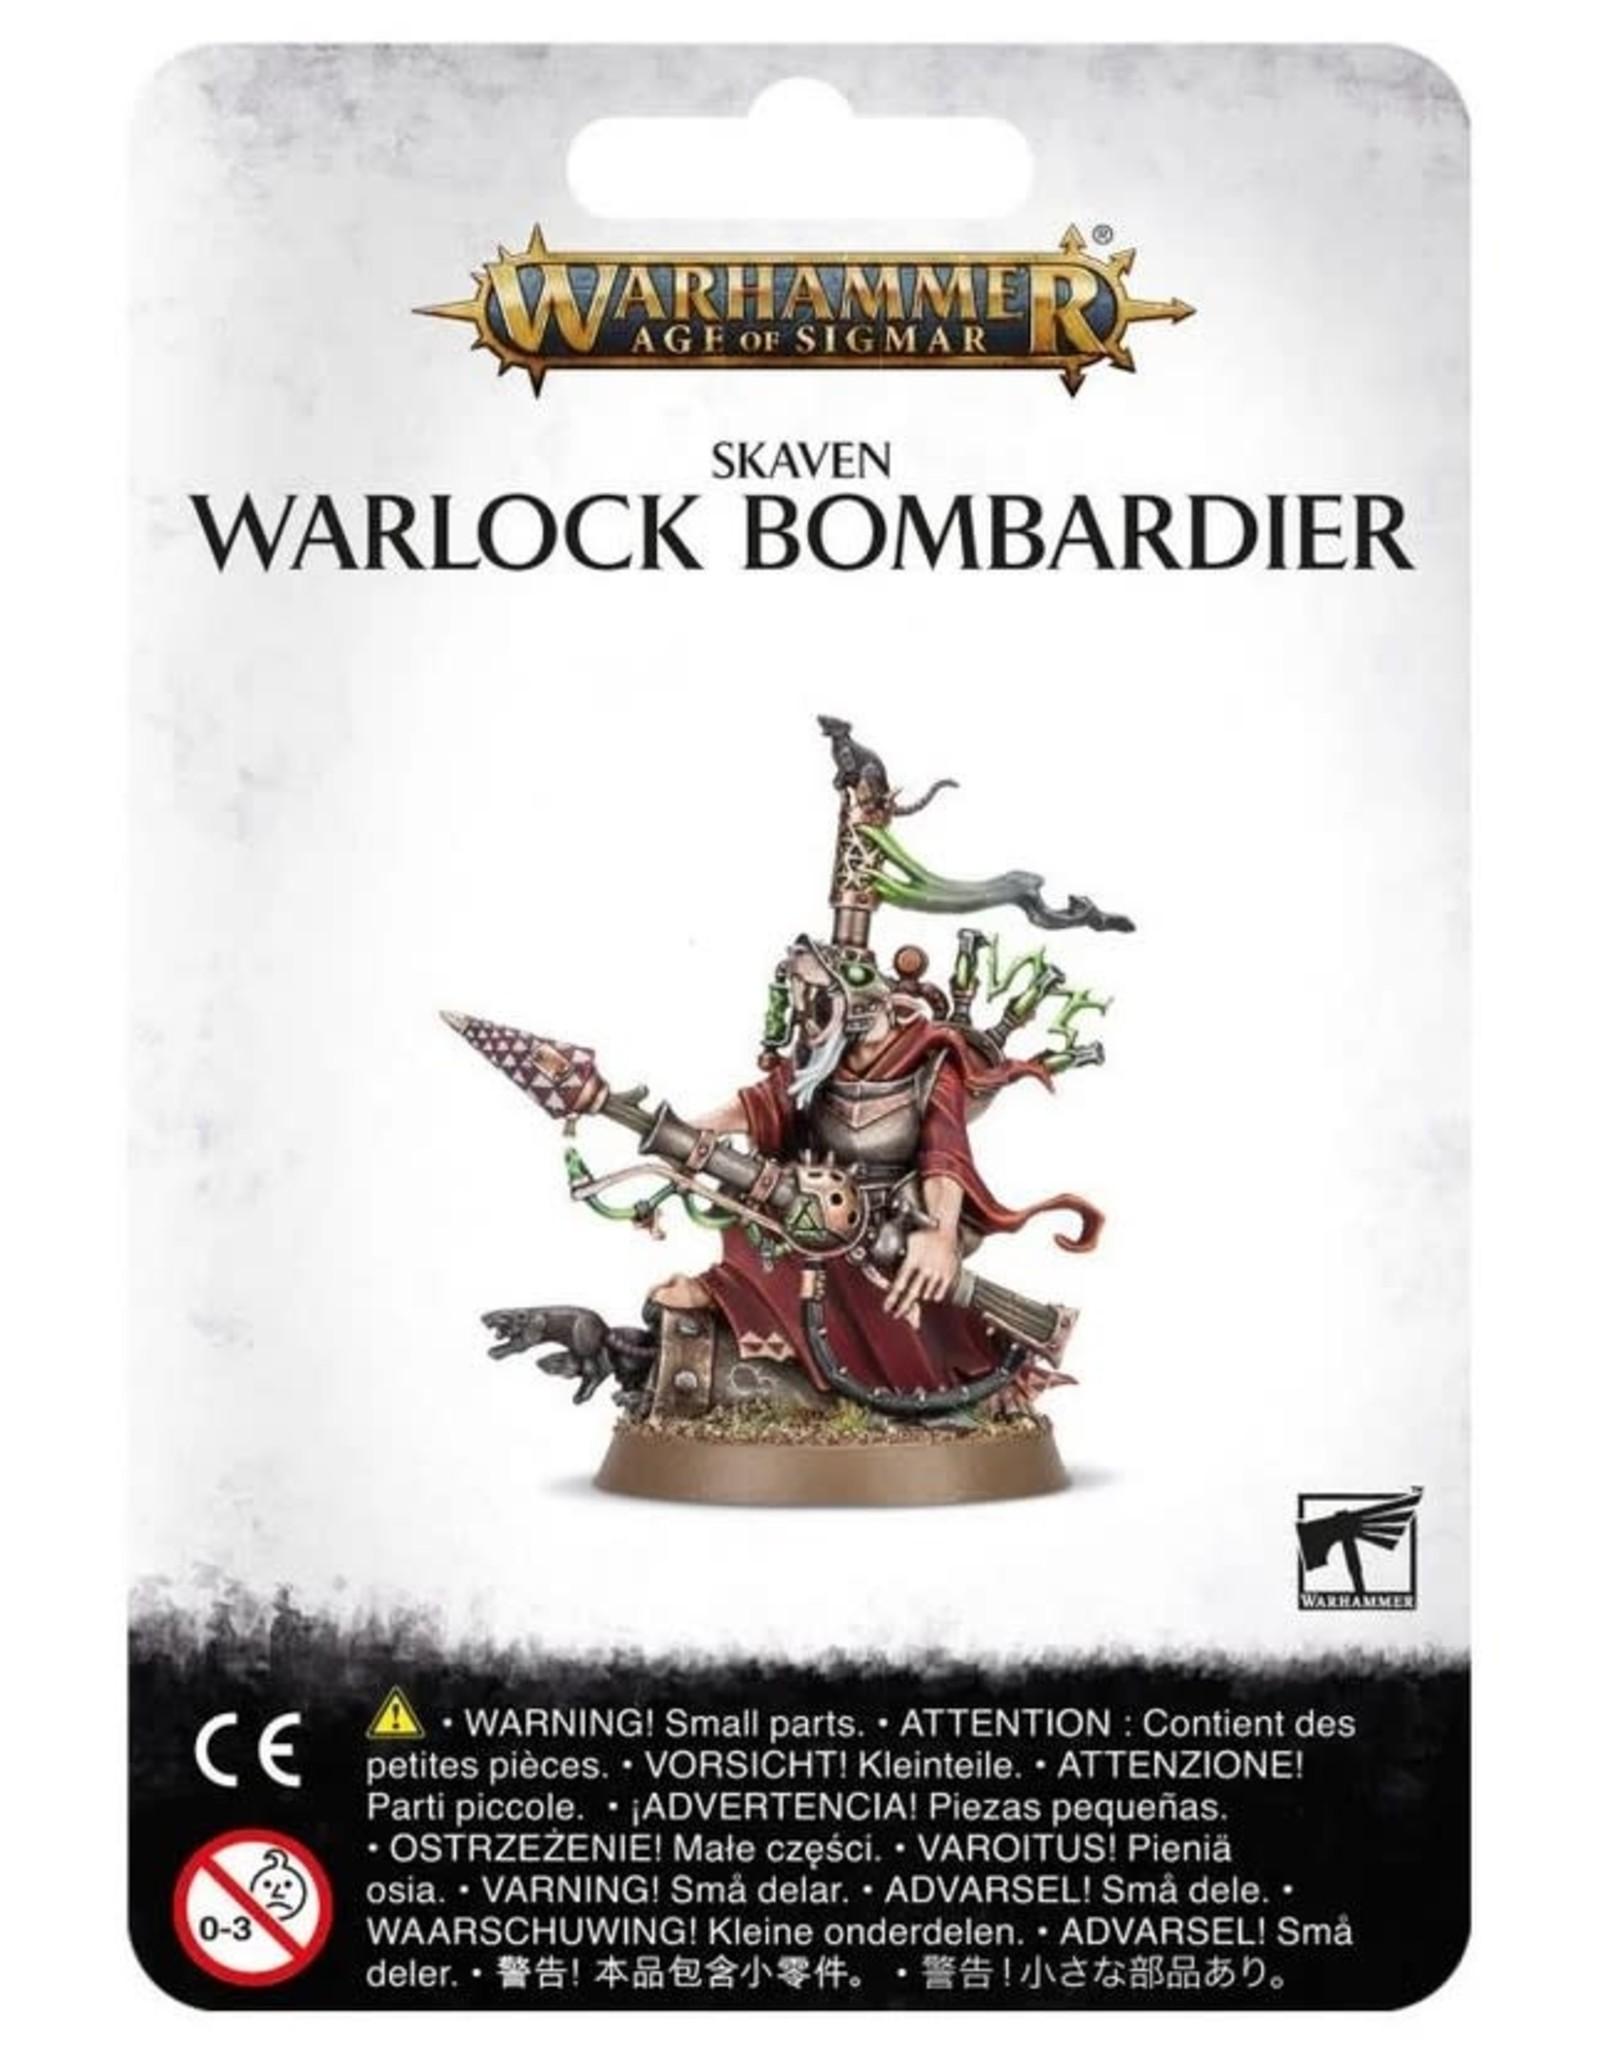 Warhammer AoS WHAoS Skaven Warlock Bombardier